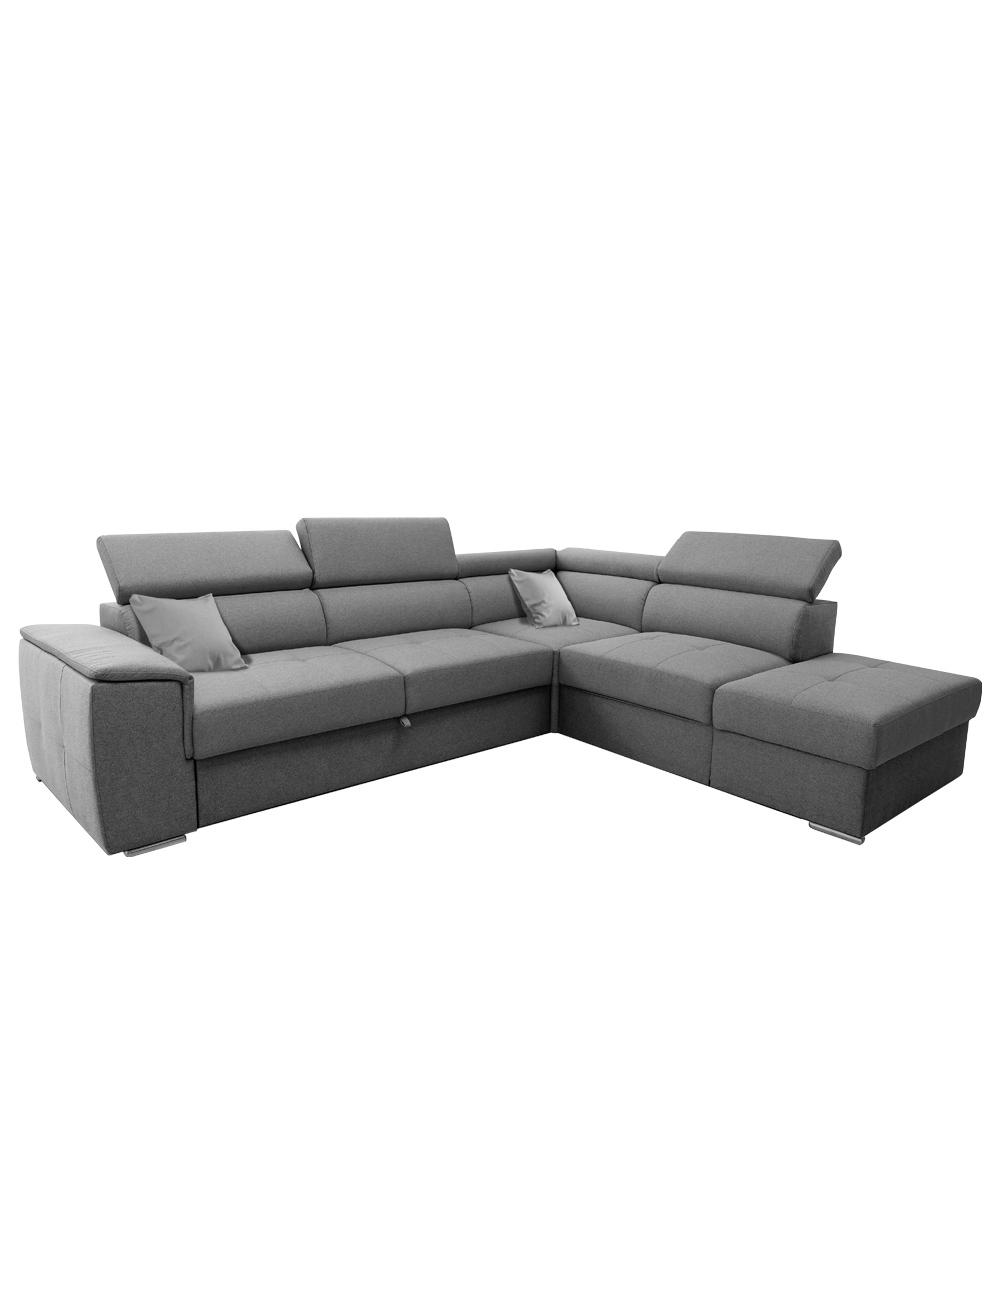 bouchon de lavabo 3d canard. Black Bedroom Furniture Sets. Home Design Ideas